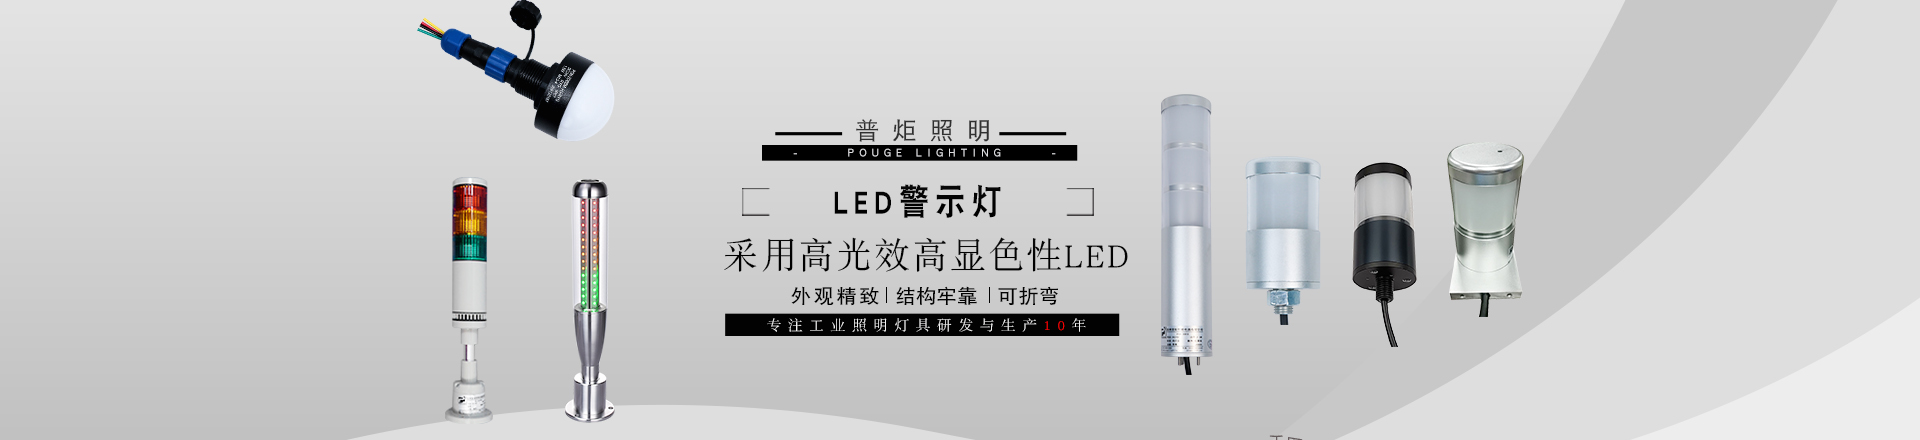 LED报警灯